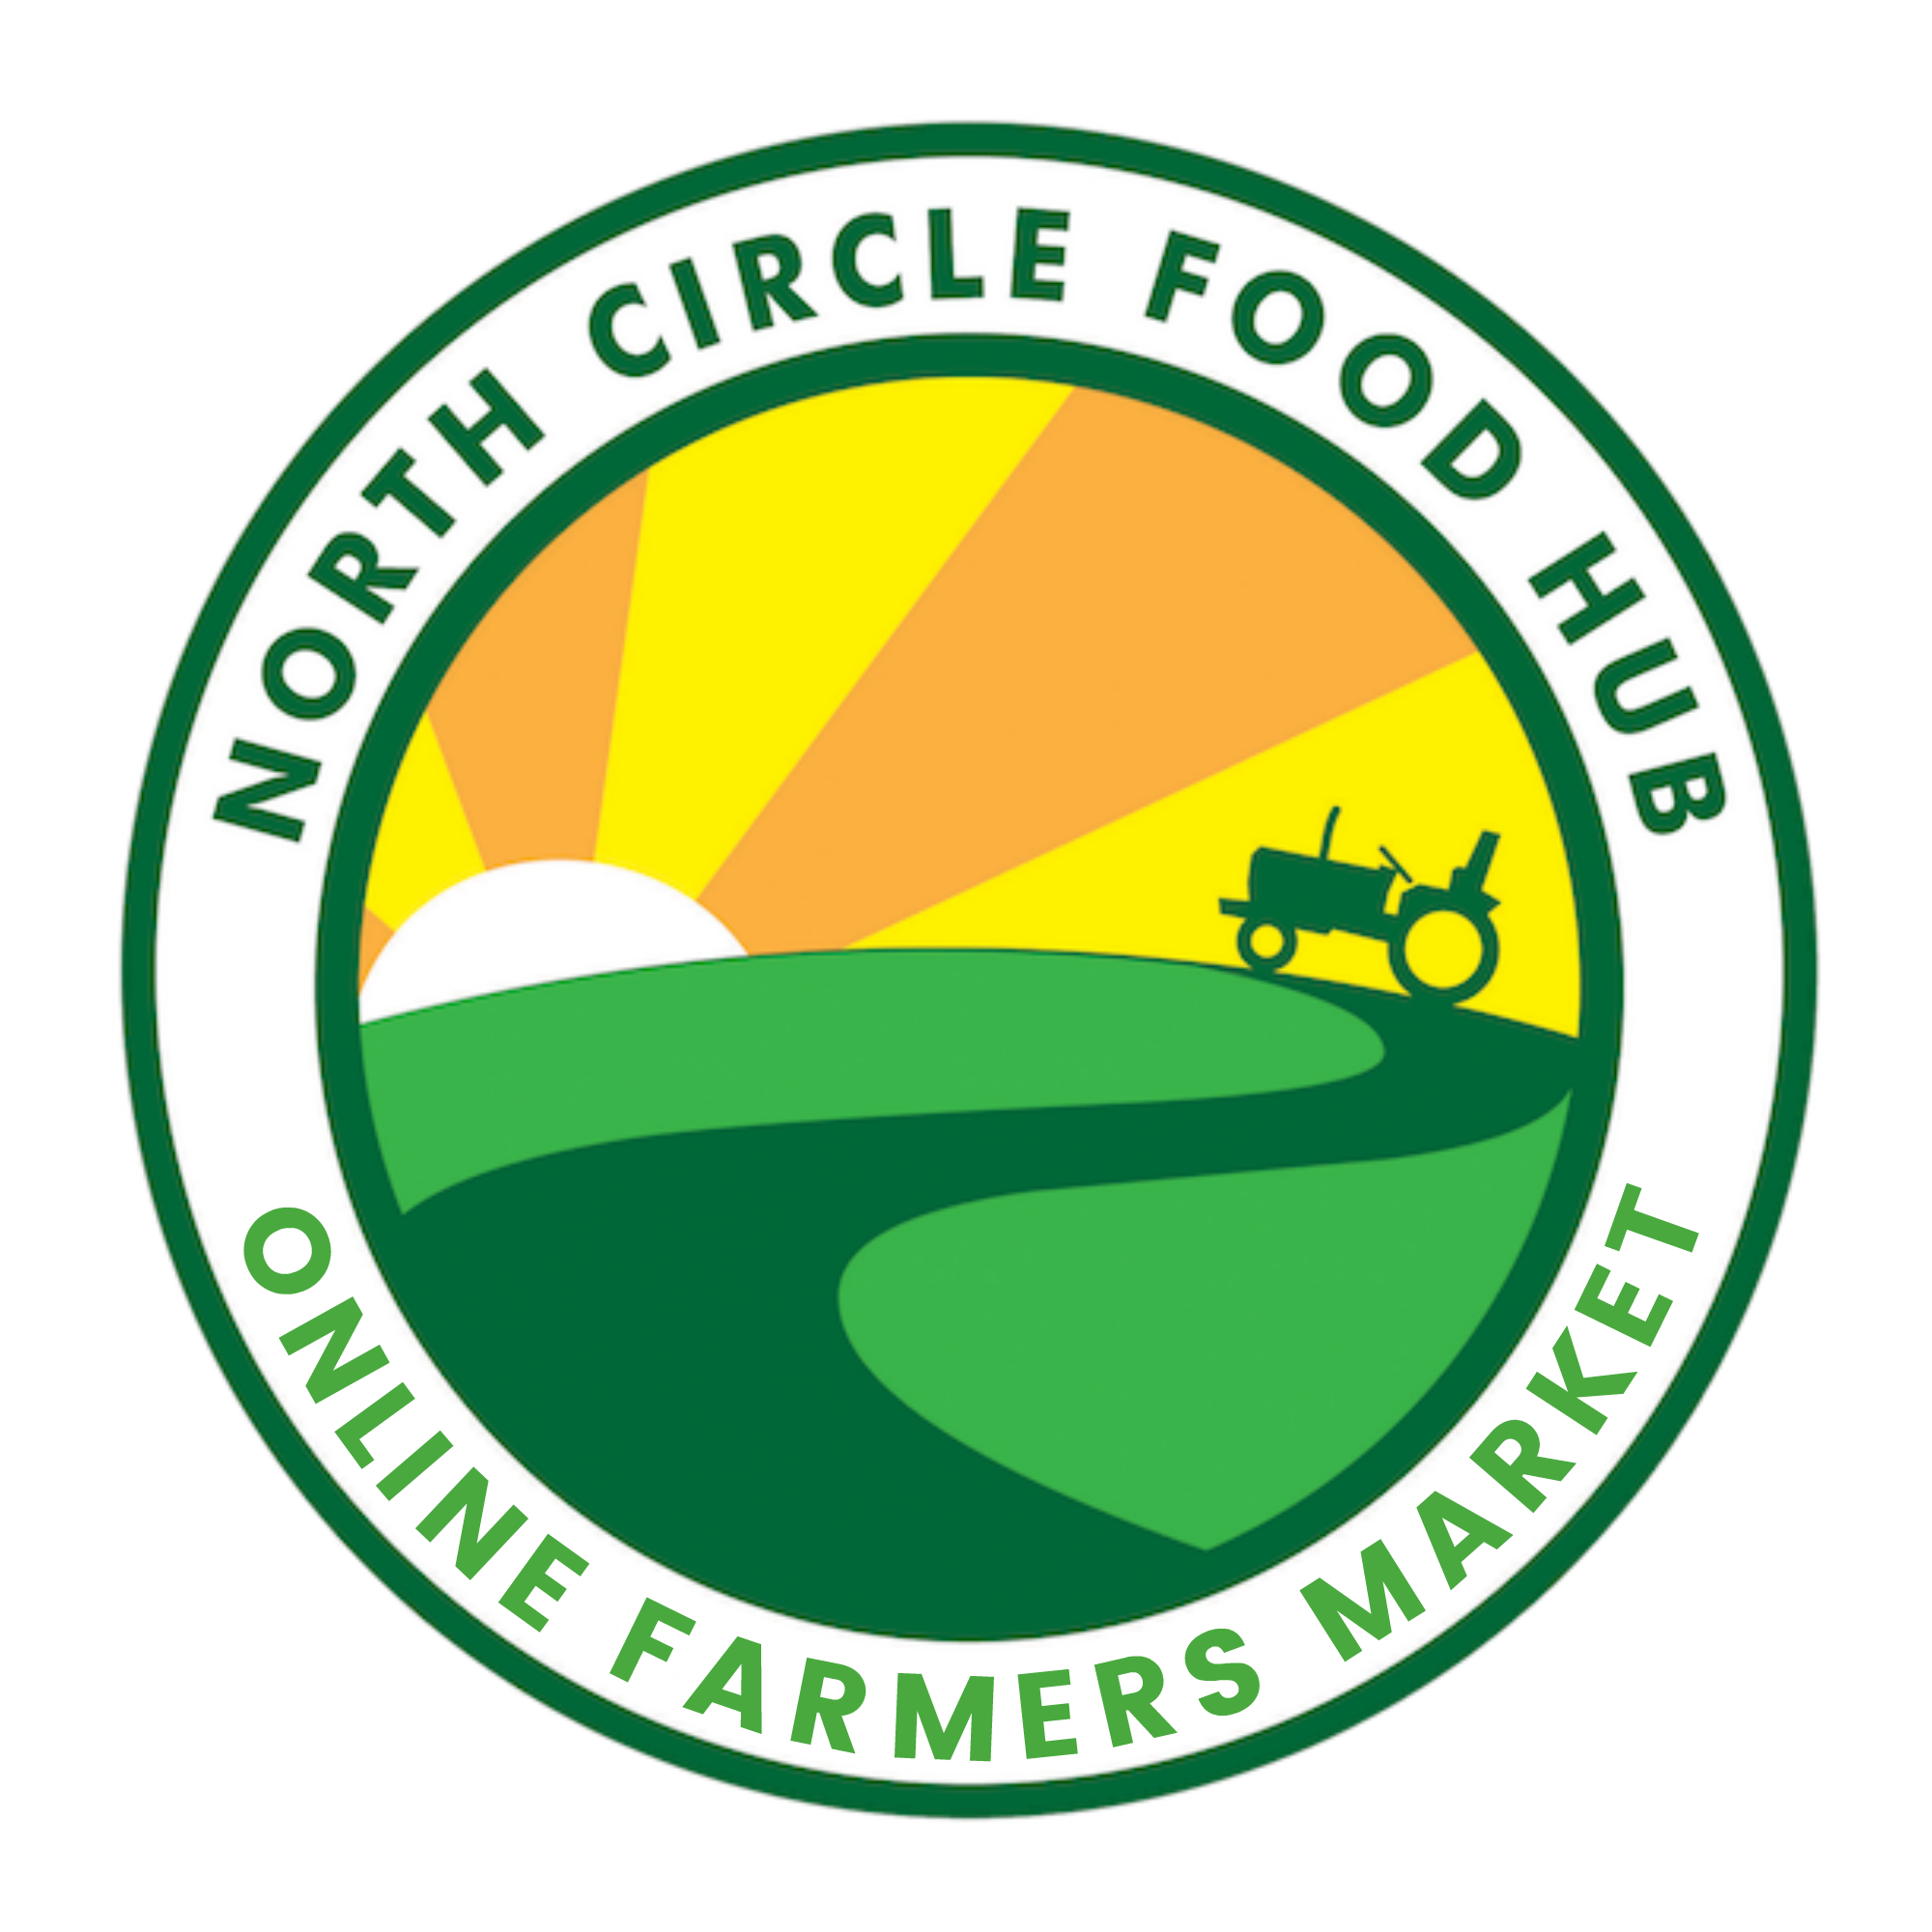 Our farmers north circle. Farming clipart agriculture logo